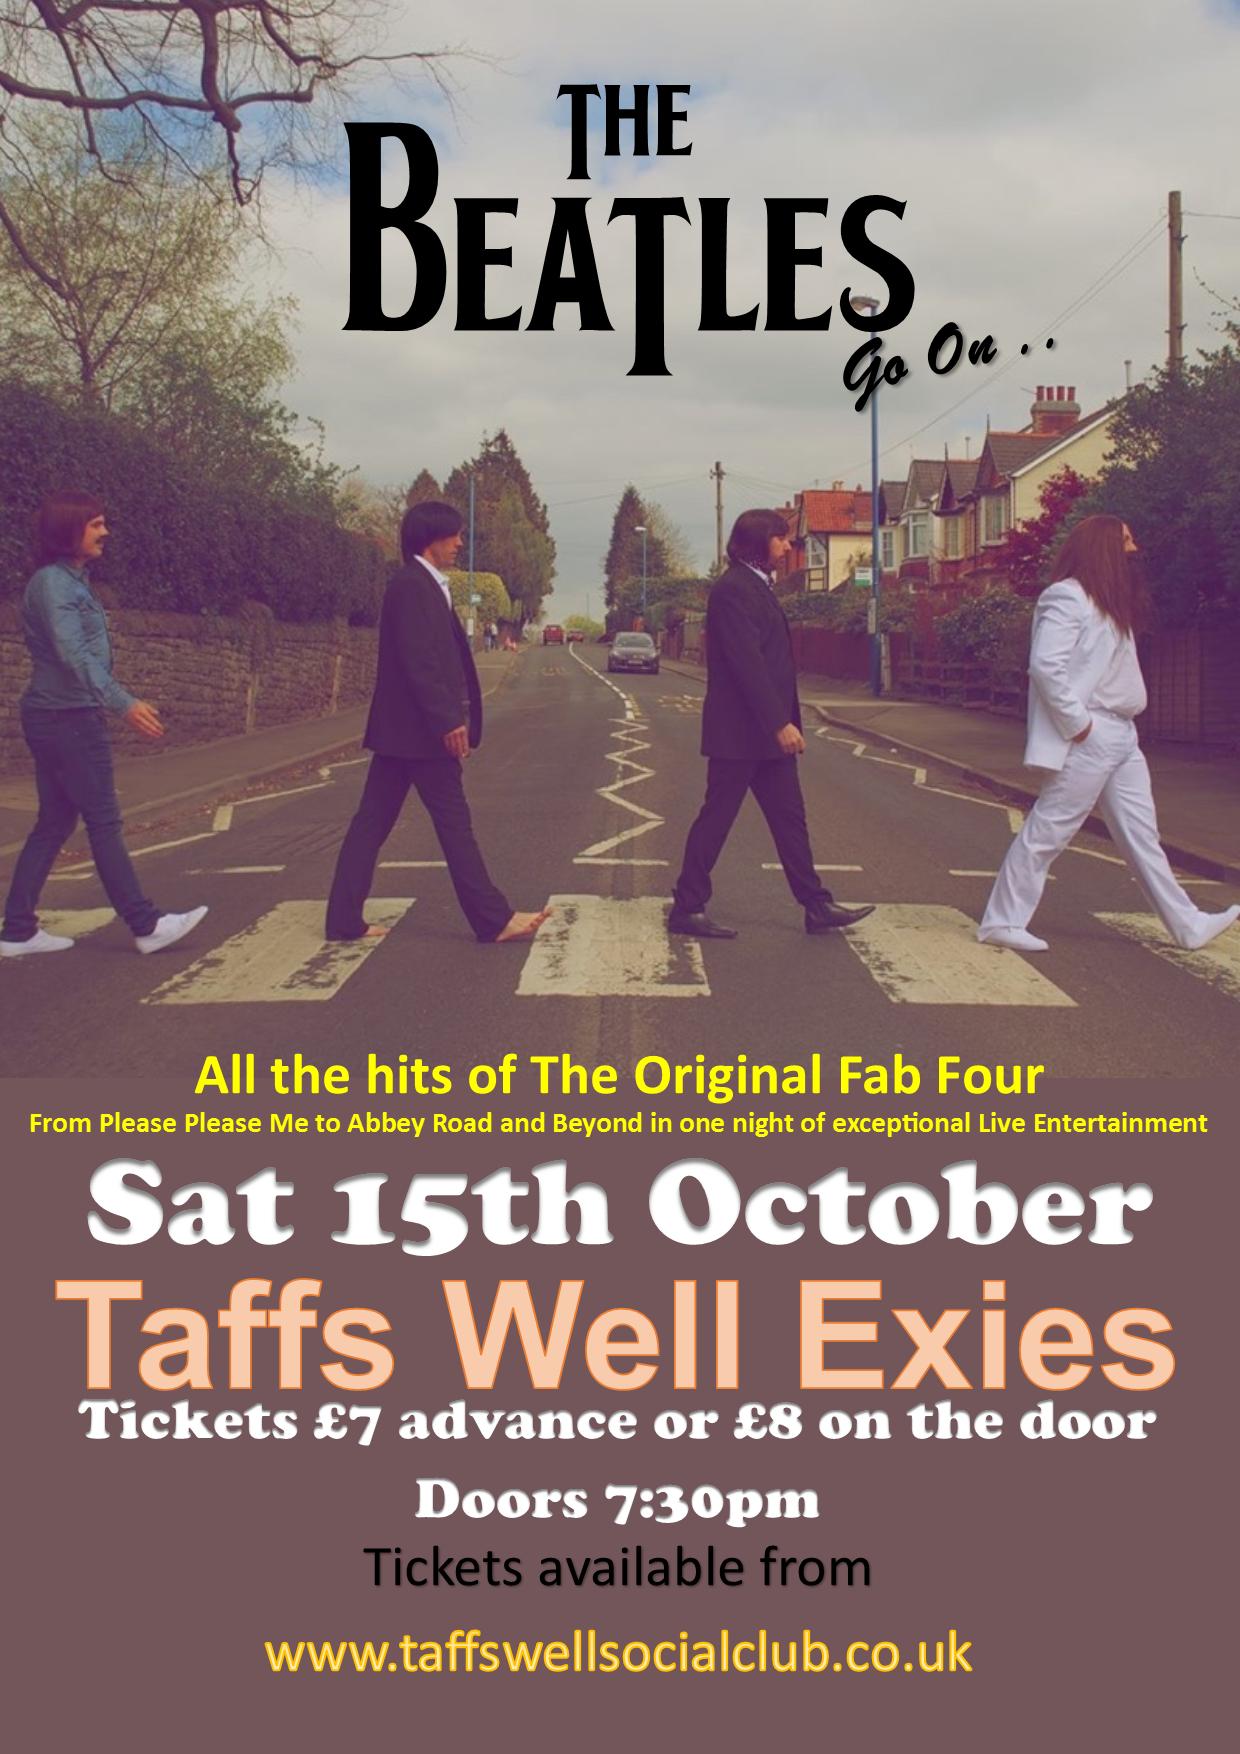 THE BEATLES GO ON - TAFFS WELL EXIES - 15/10/2016